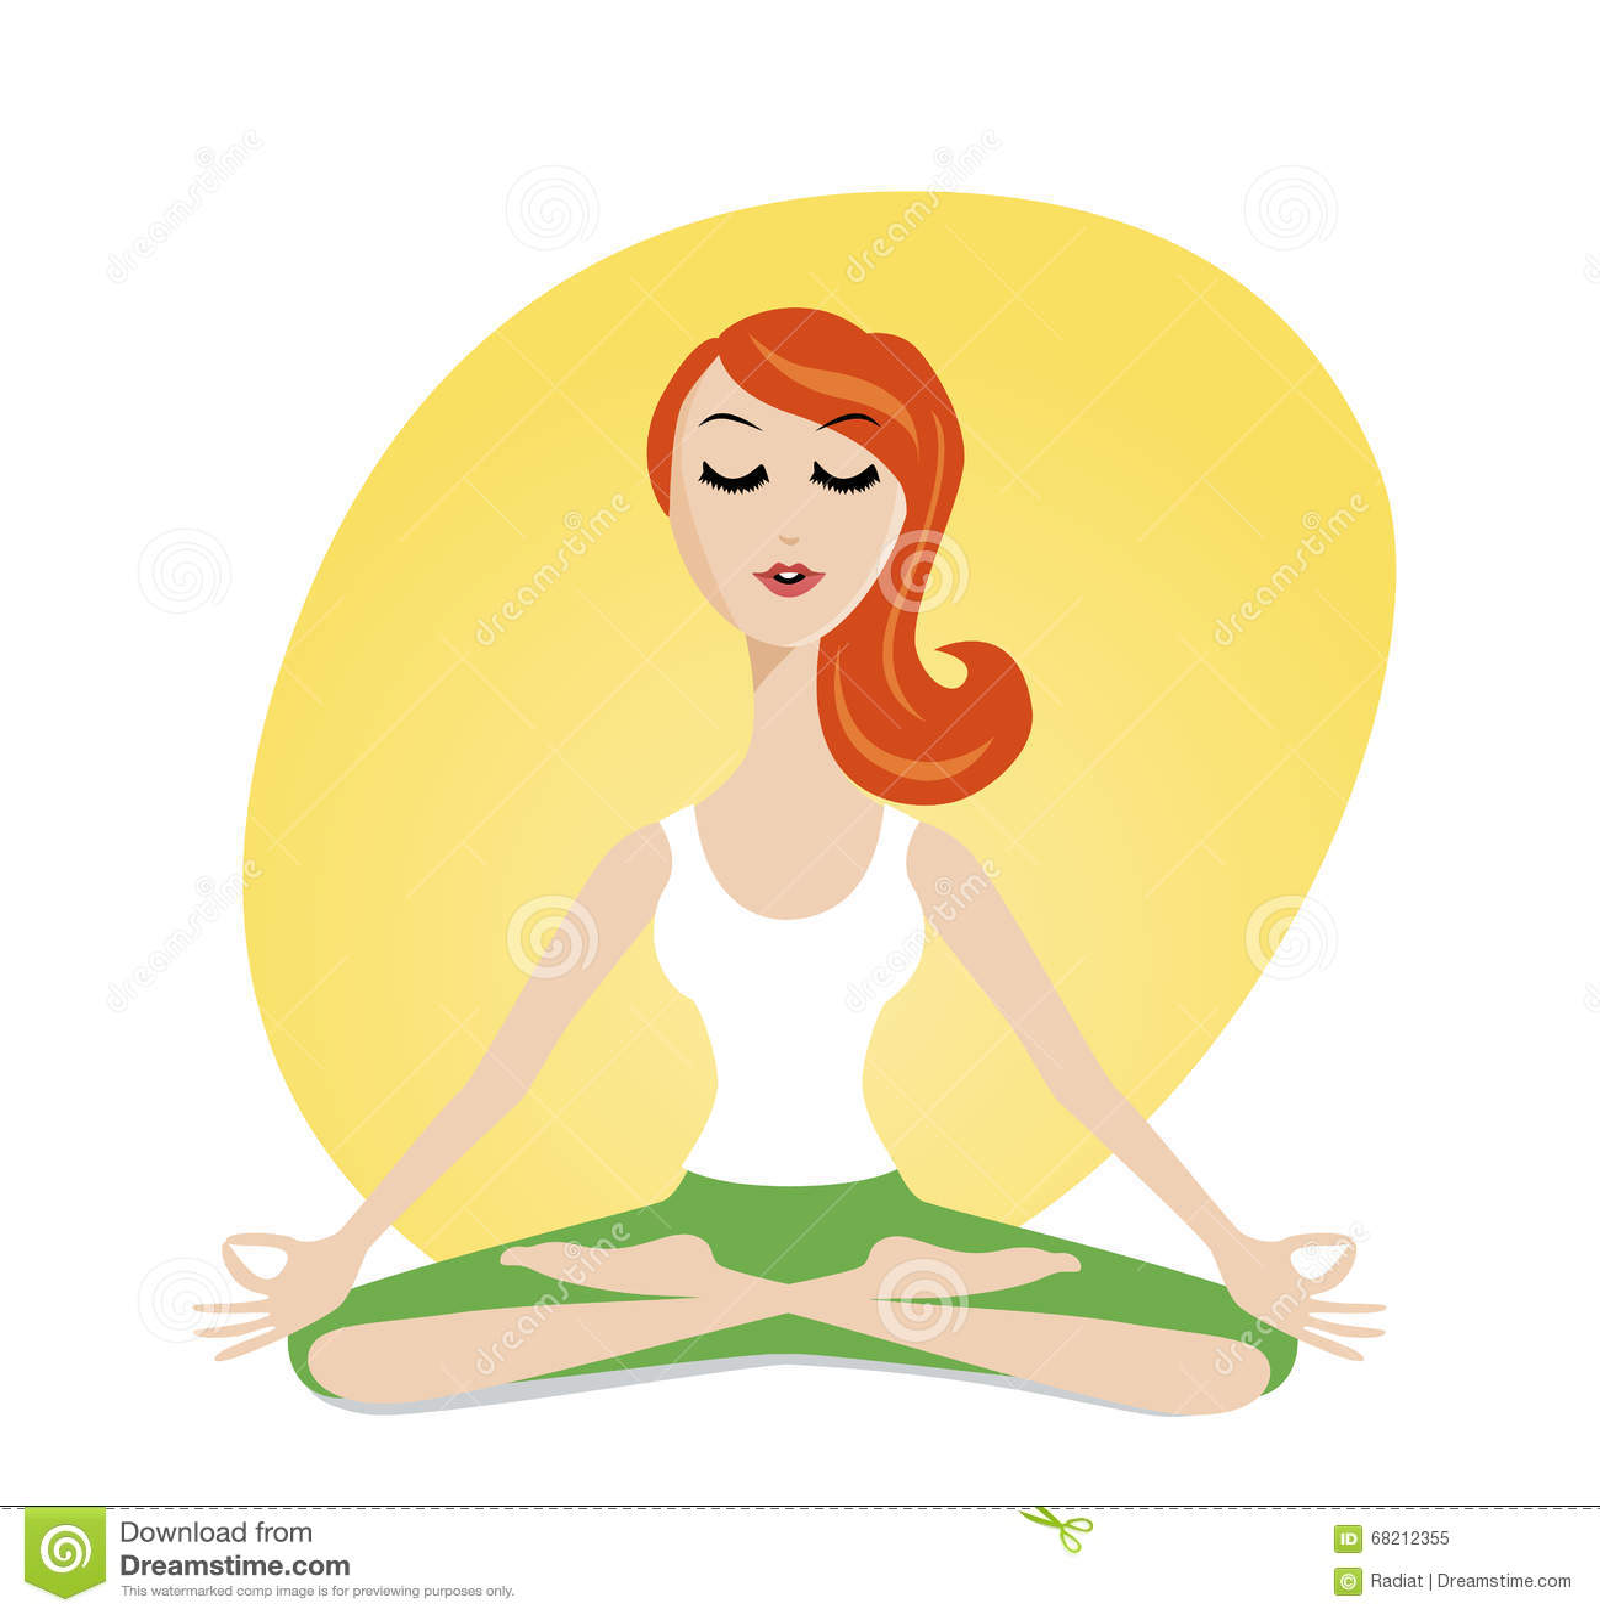 Cute Meditating Girl In Cartoon Style Illustration 68212355 Megapixl